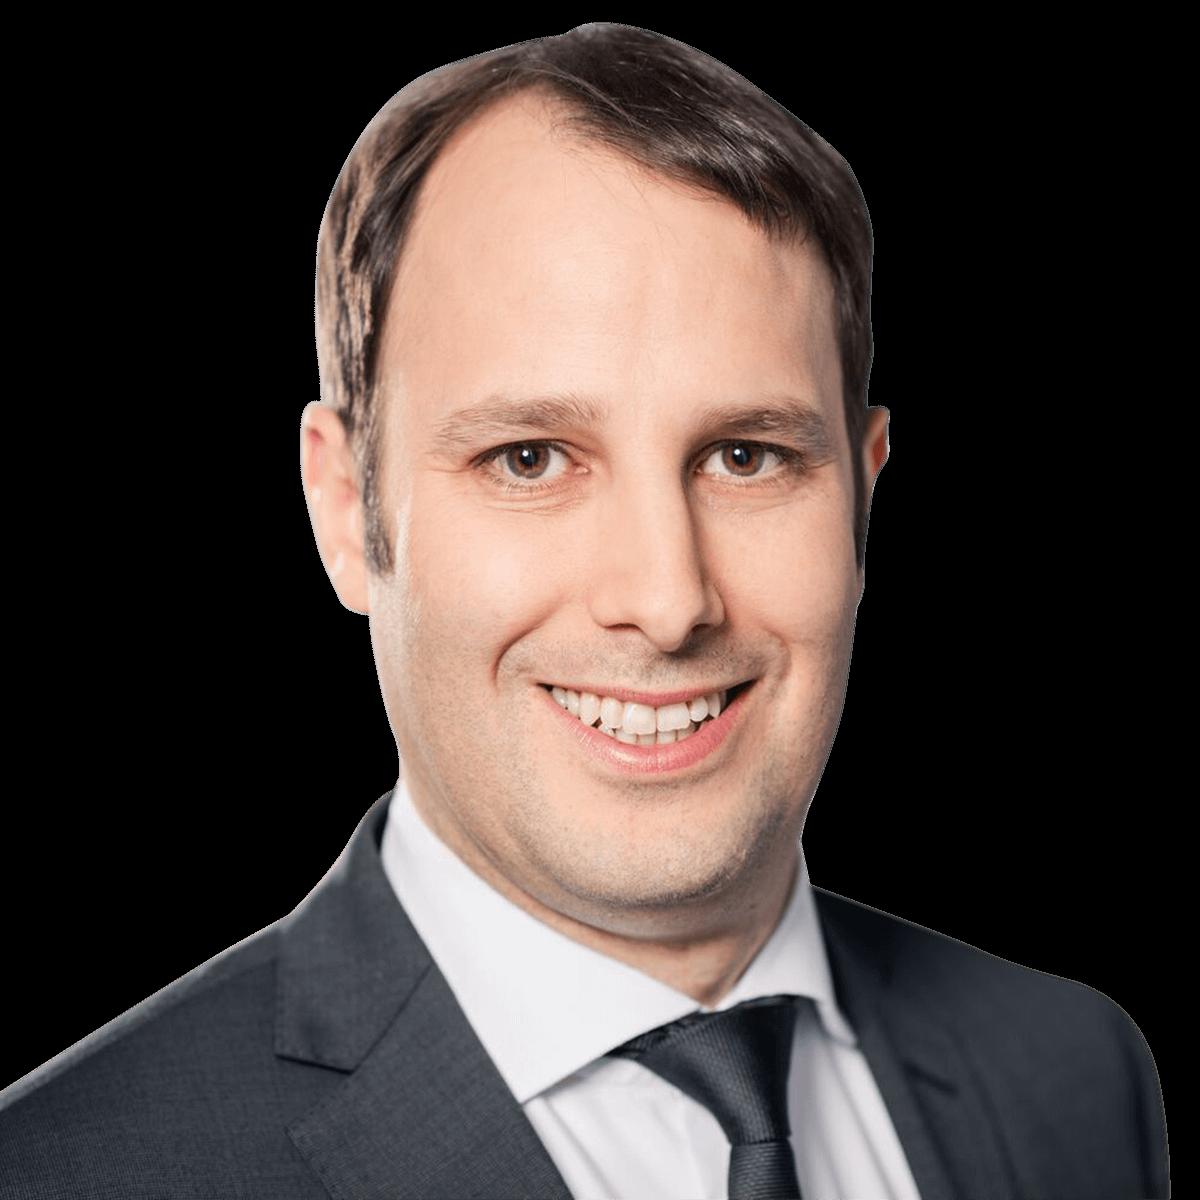 Marc Muntermann